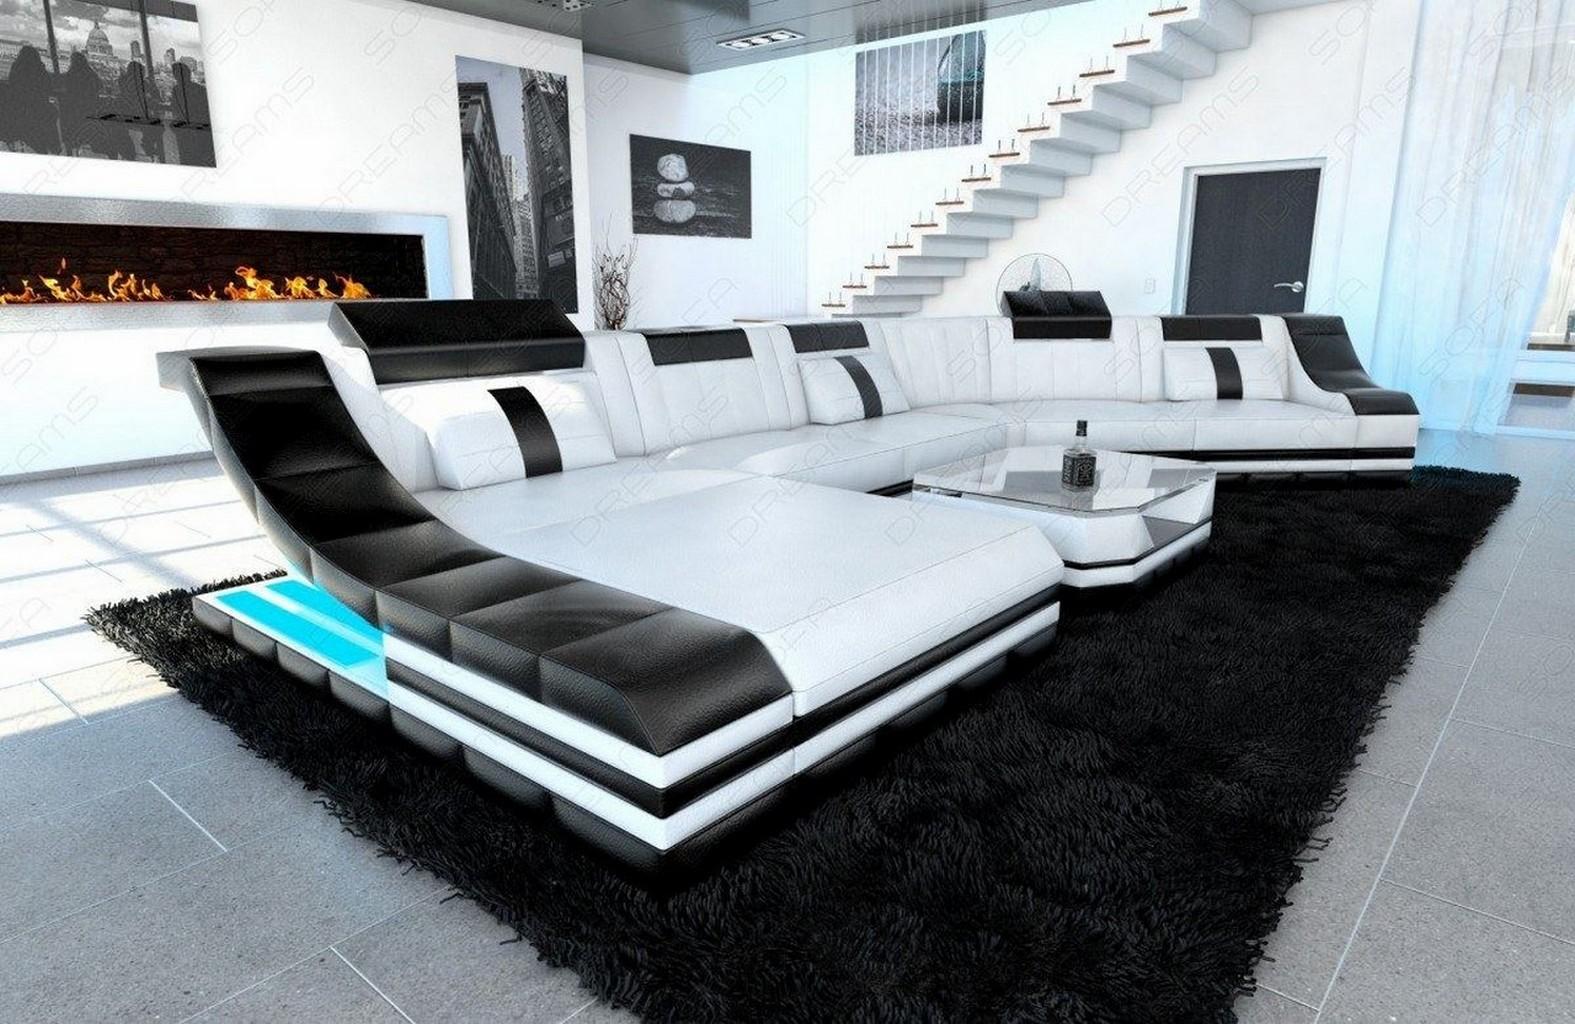 ledergarnitur wohnlandschaft turino cl mit led licht ledersofa couch ecksofa. Black Bedroom Furniture Sets. Home Design Ideas